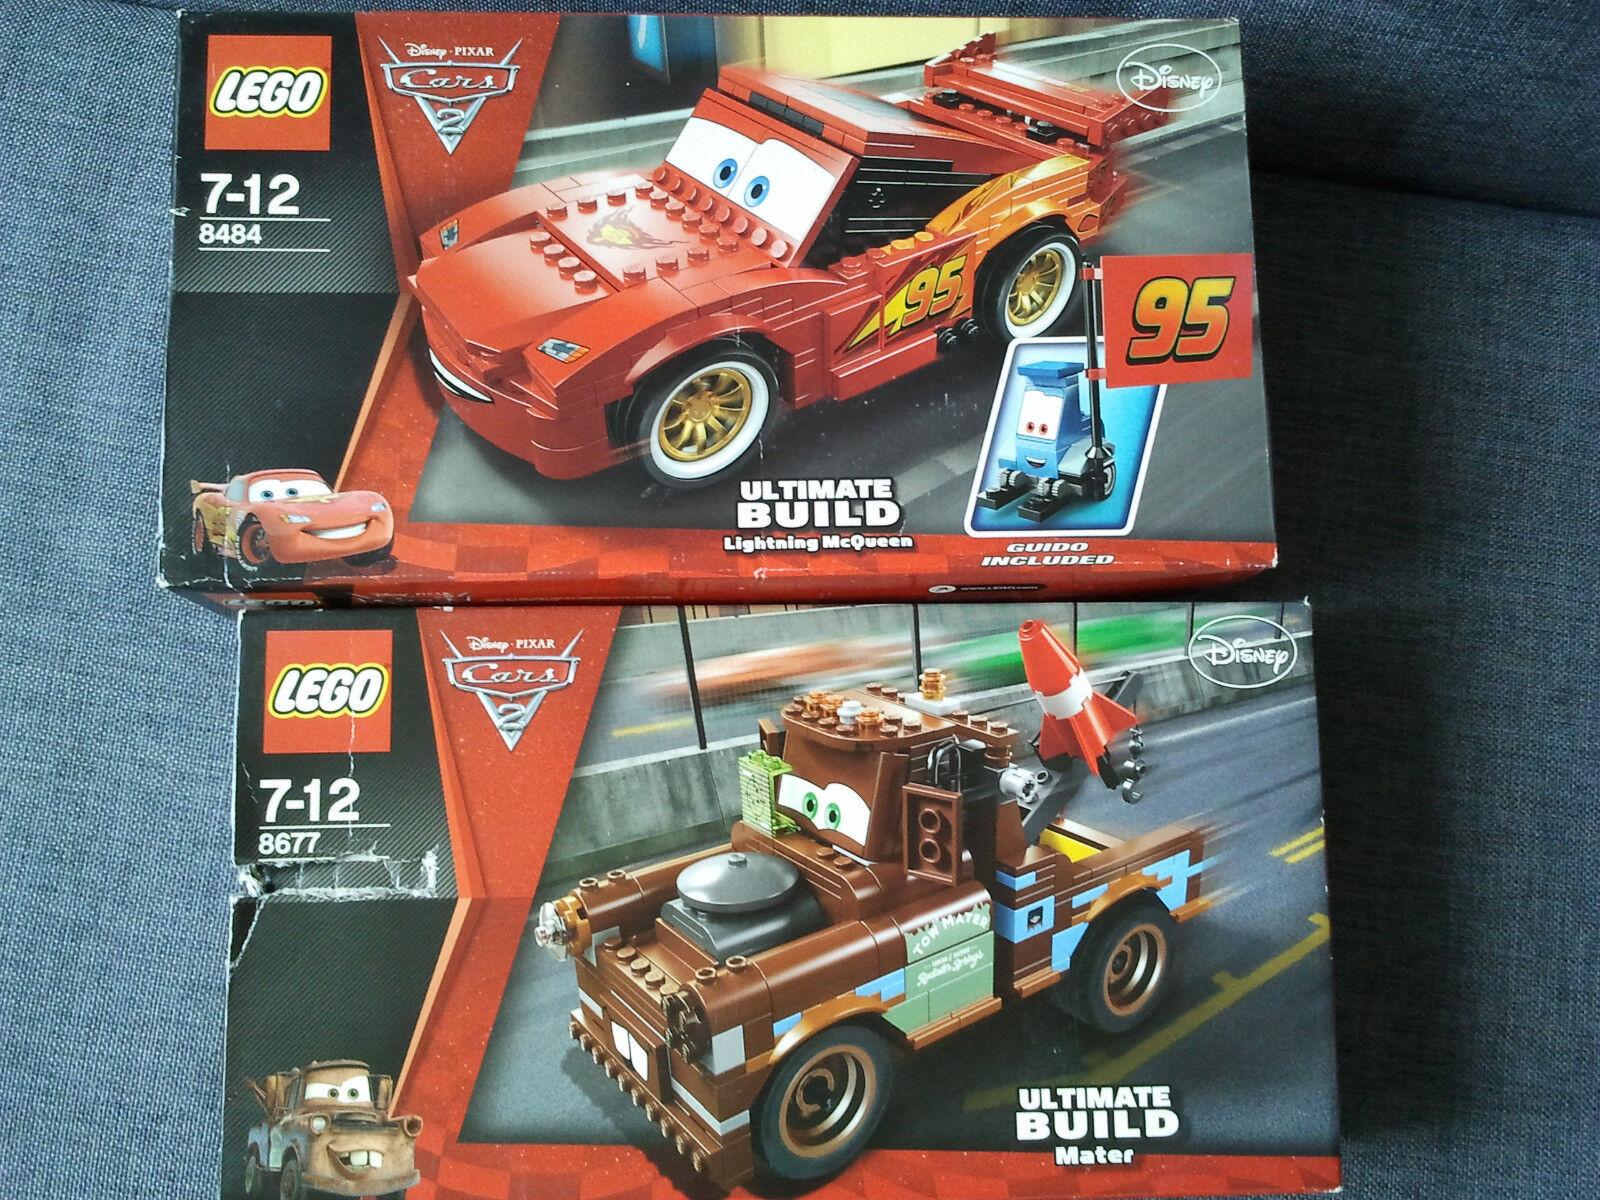 Lego Cars 8484 8677 Flash Martin Neufs Lightning McQueen Mater